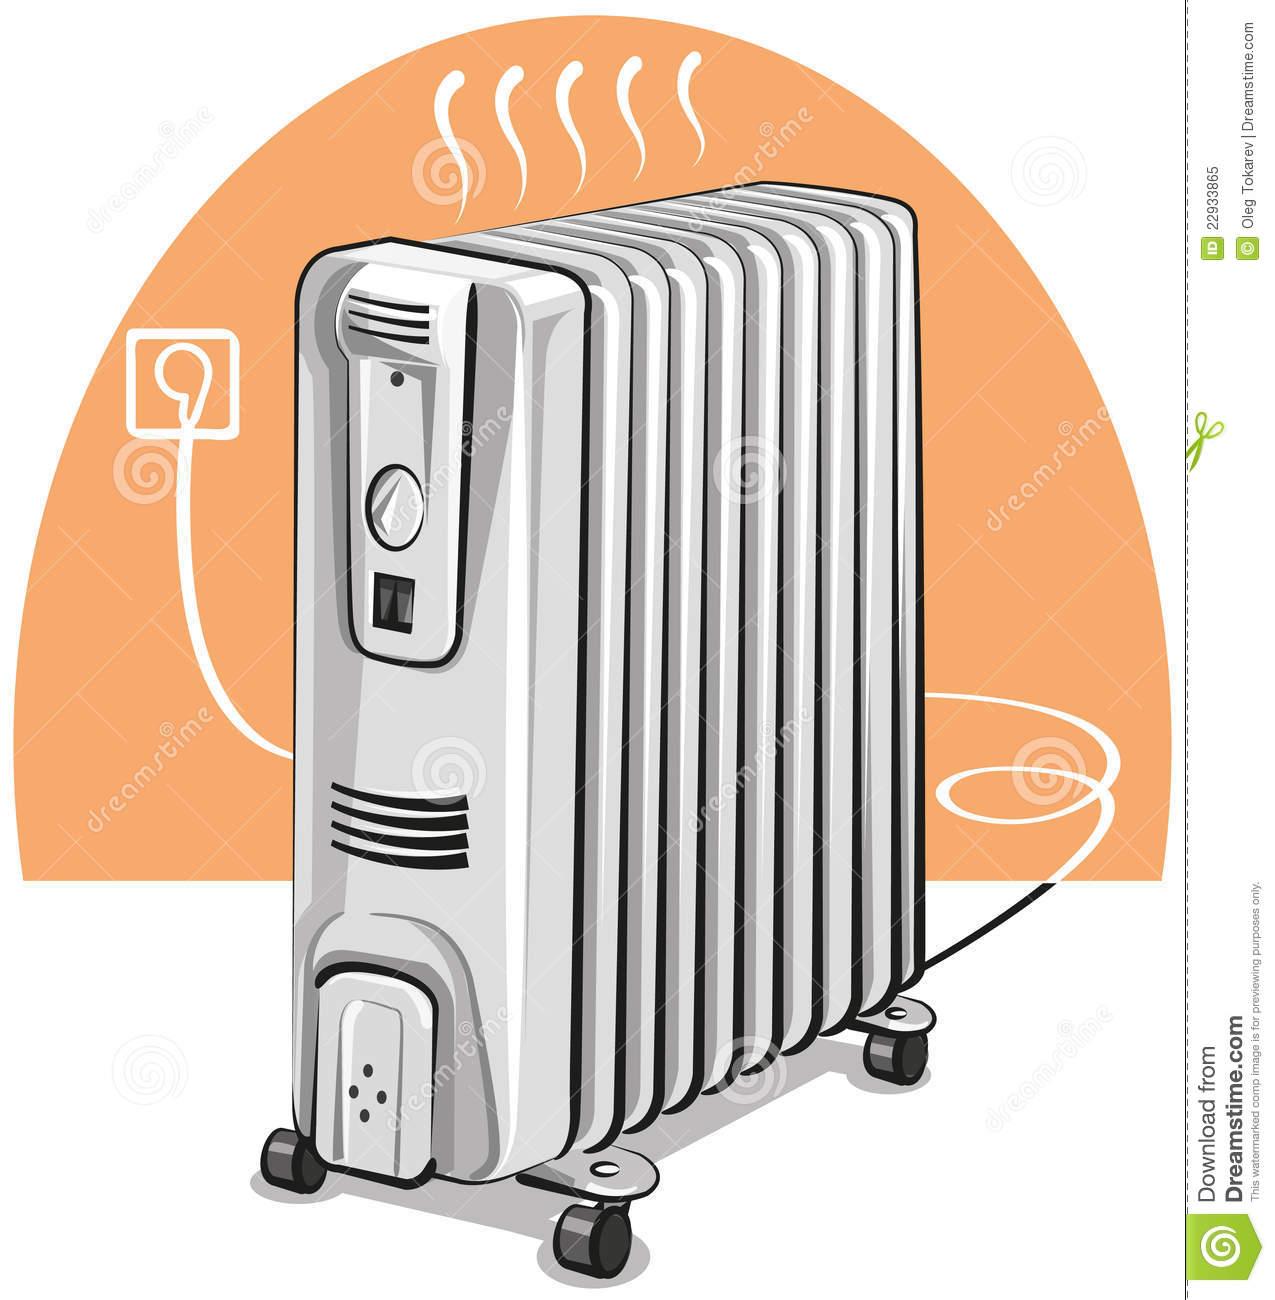 Portable Heater Clipart.